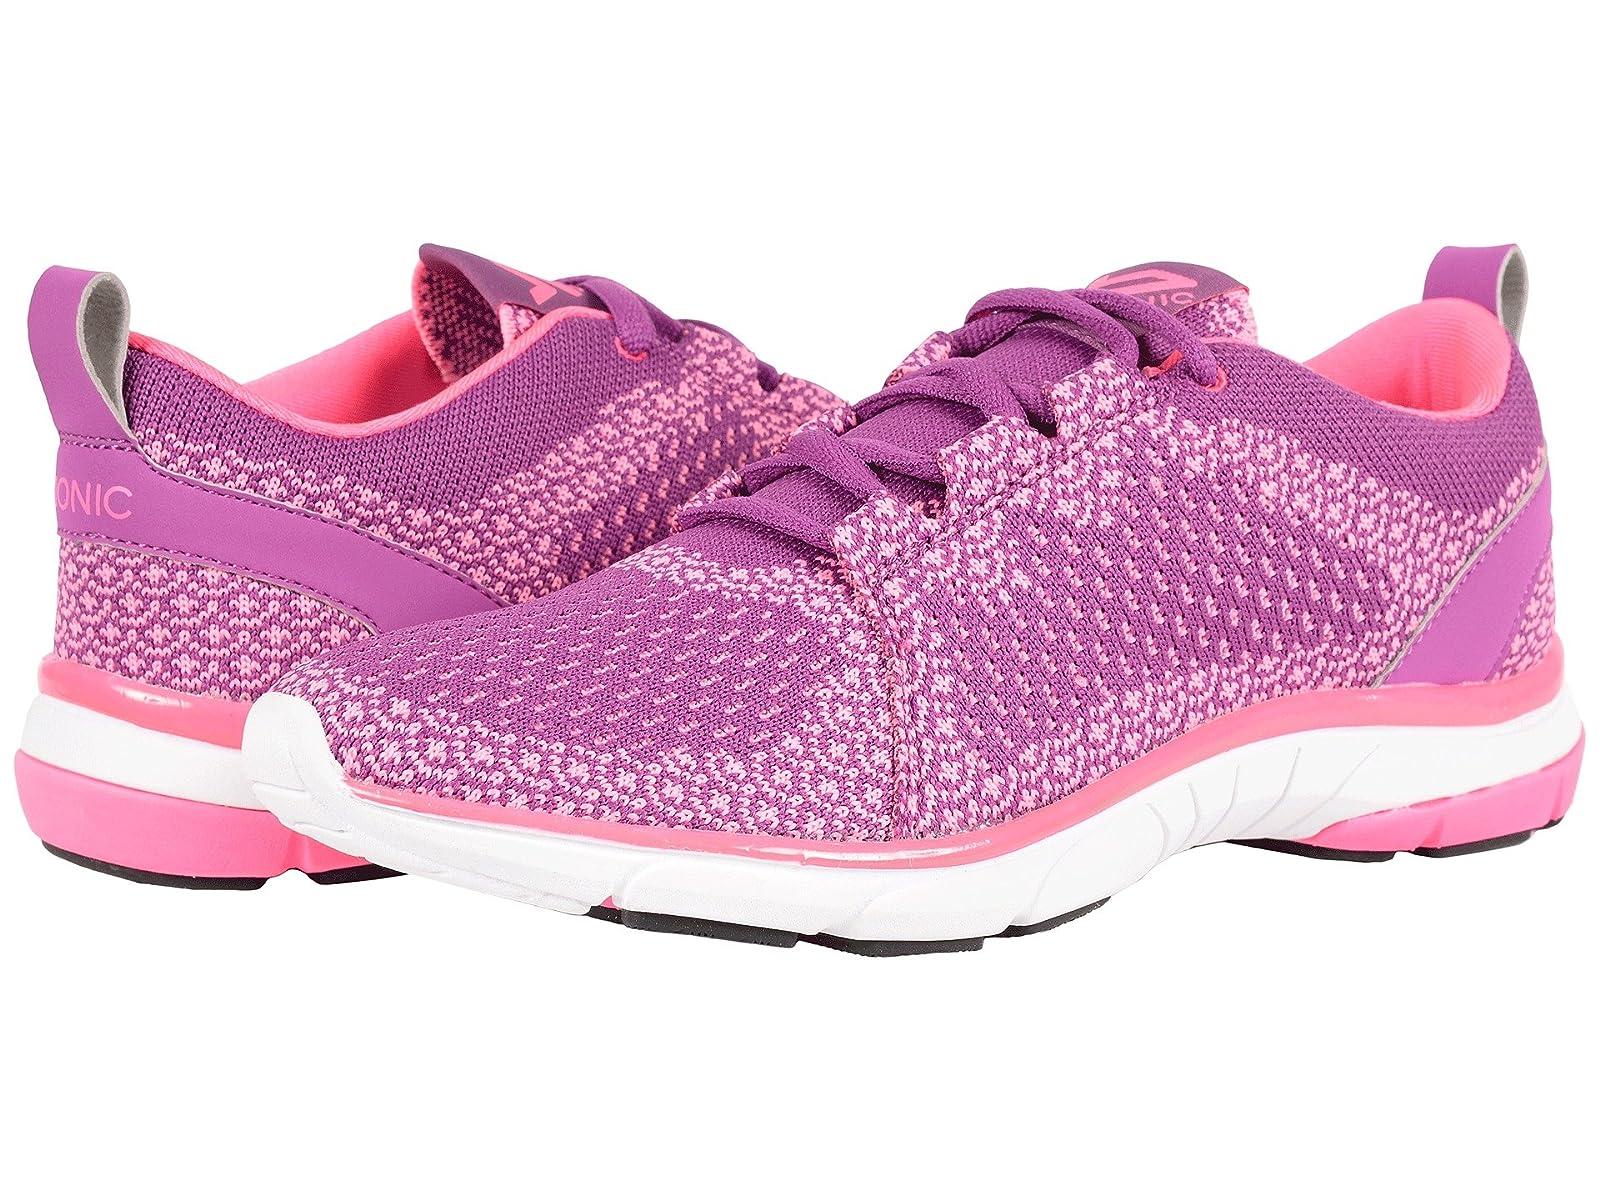 VIONIC SierraCheap and distinctive eye-catching shoes